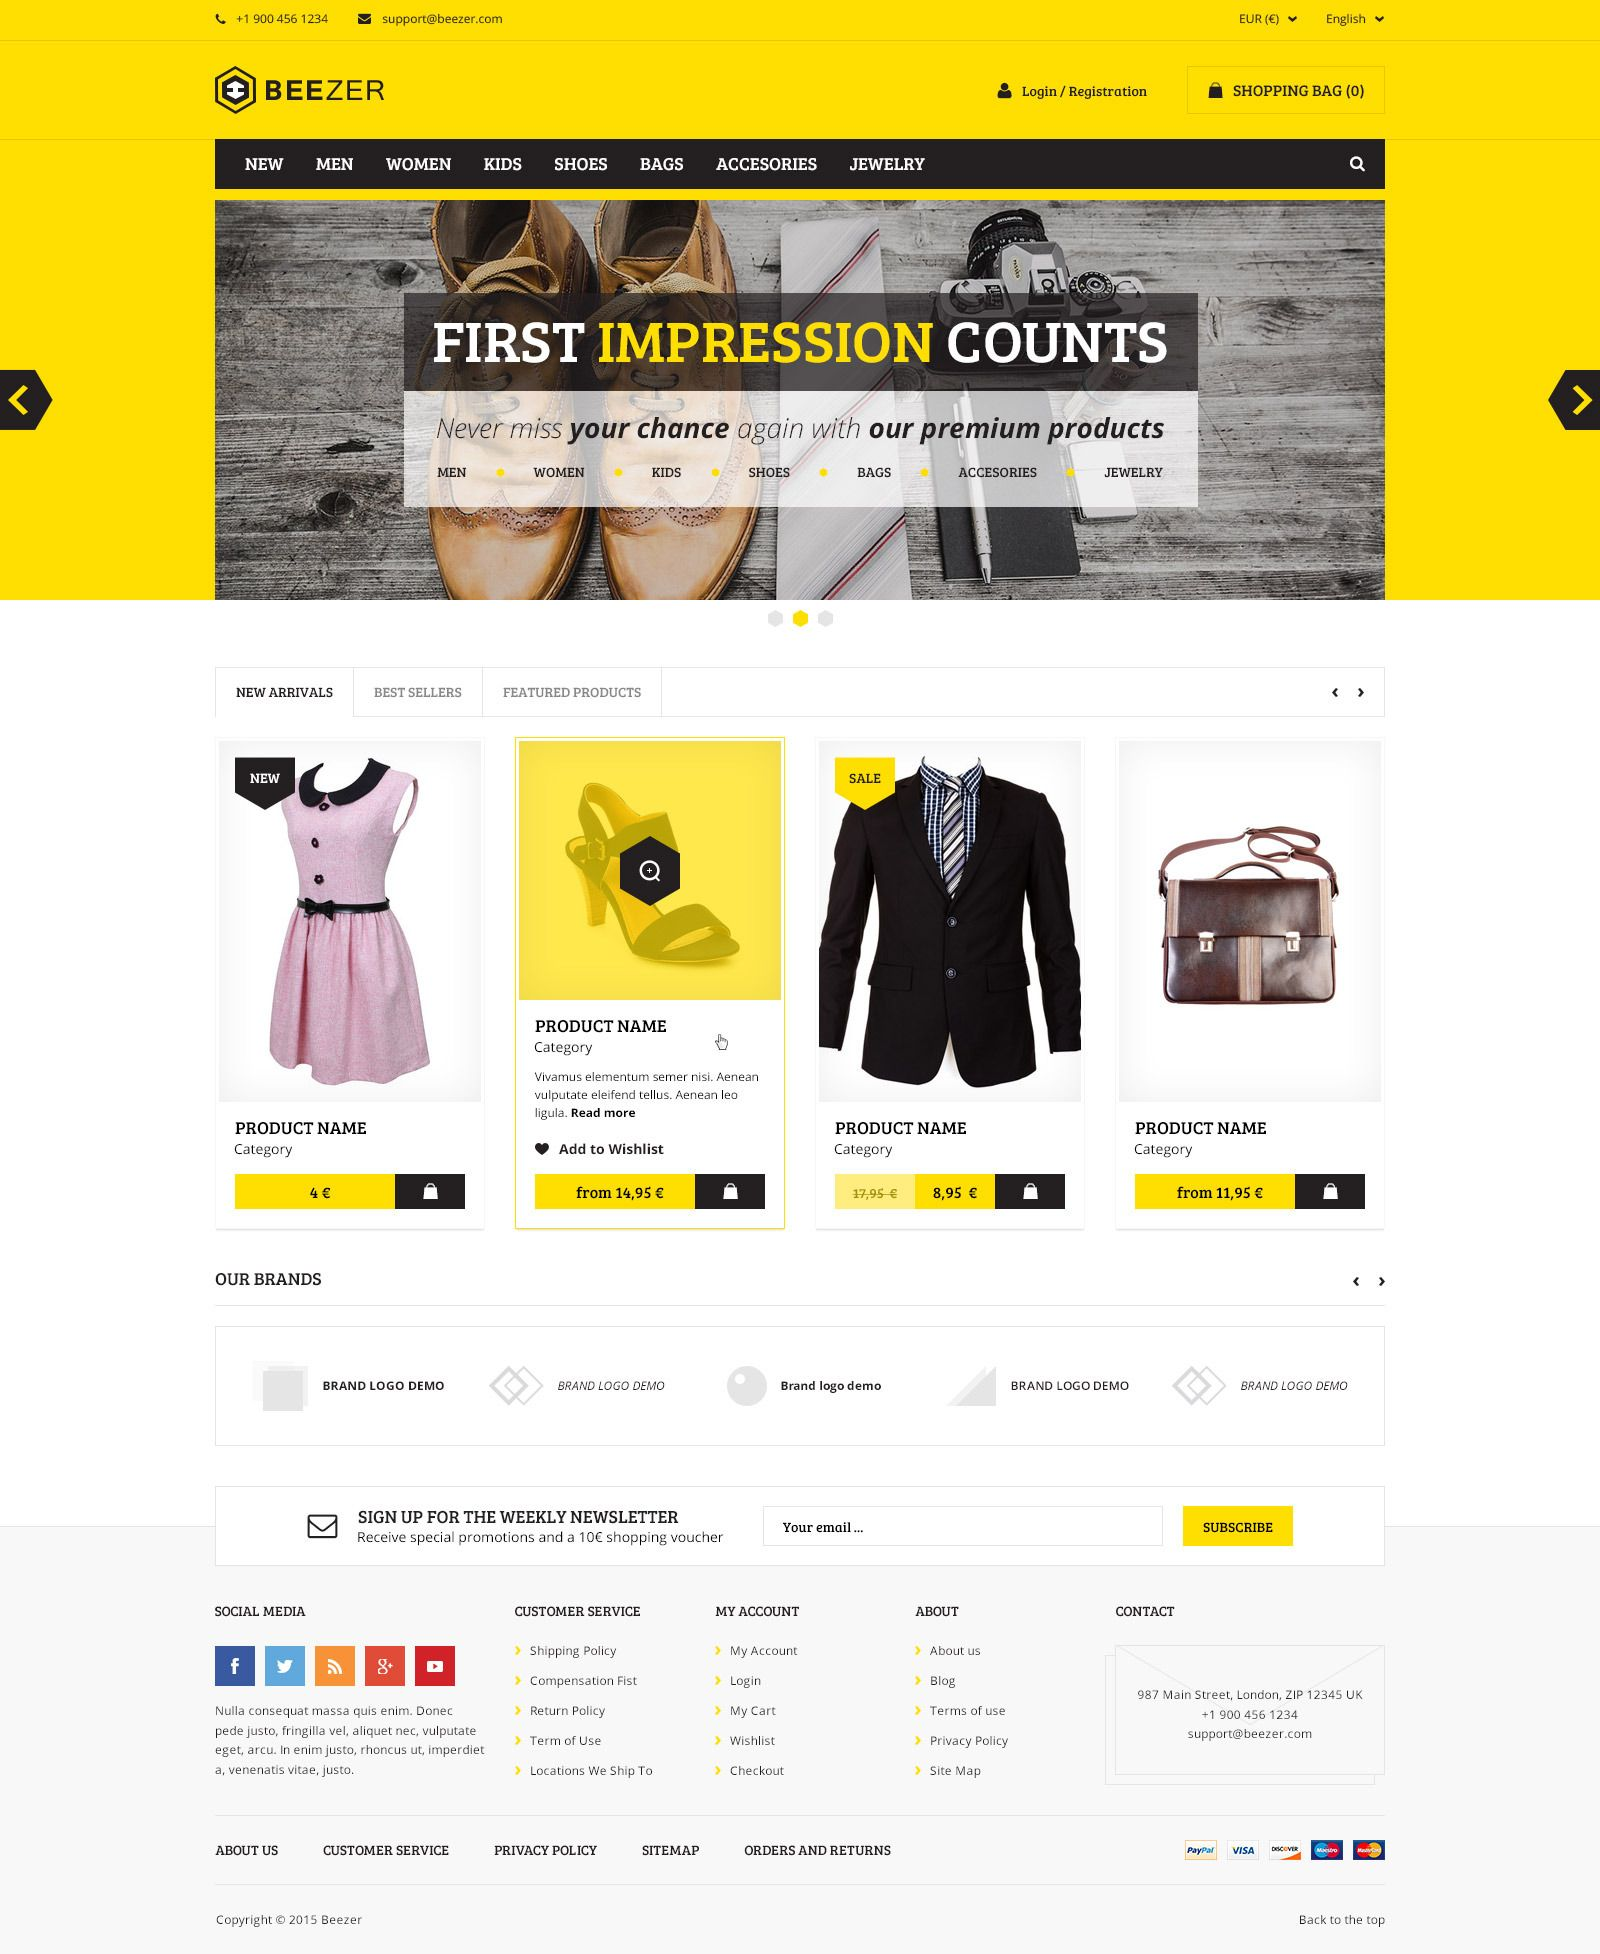 Beezer Ecommerce Psd Template Psd Templates Website Design Inspiration Ecommerce